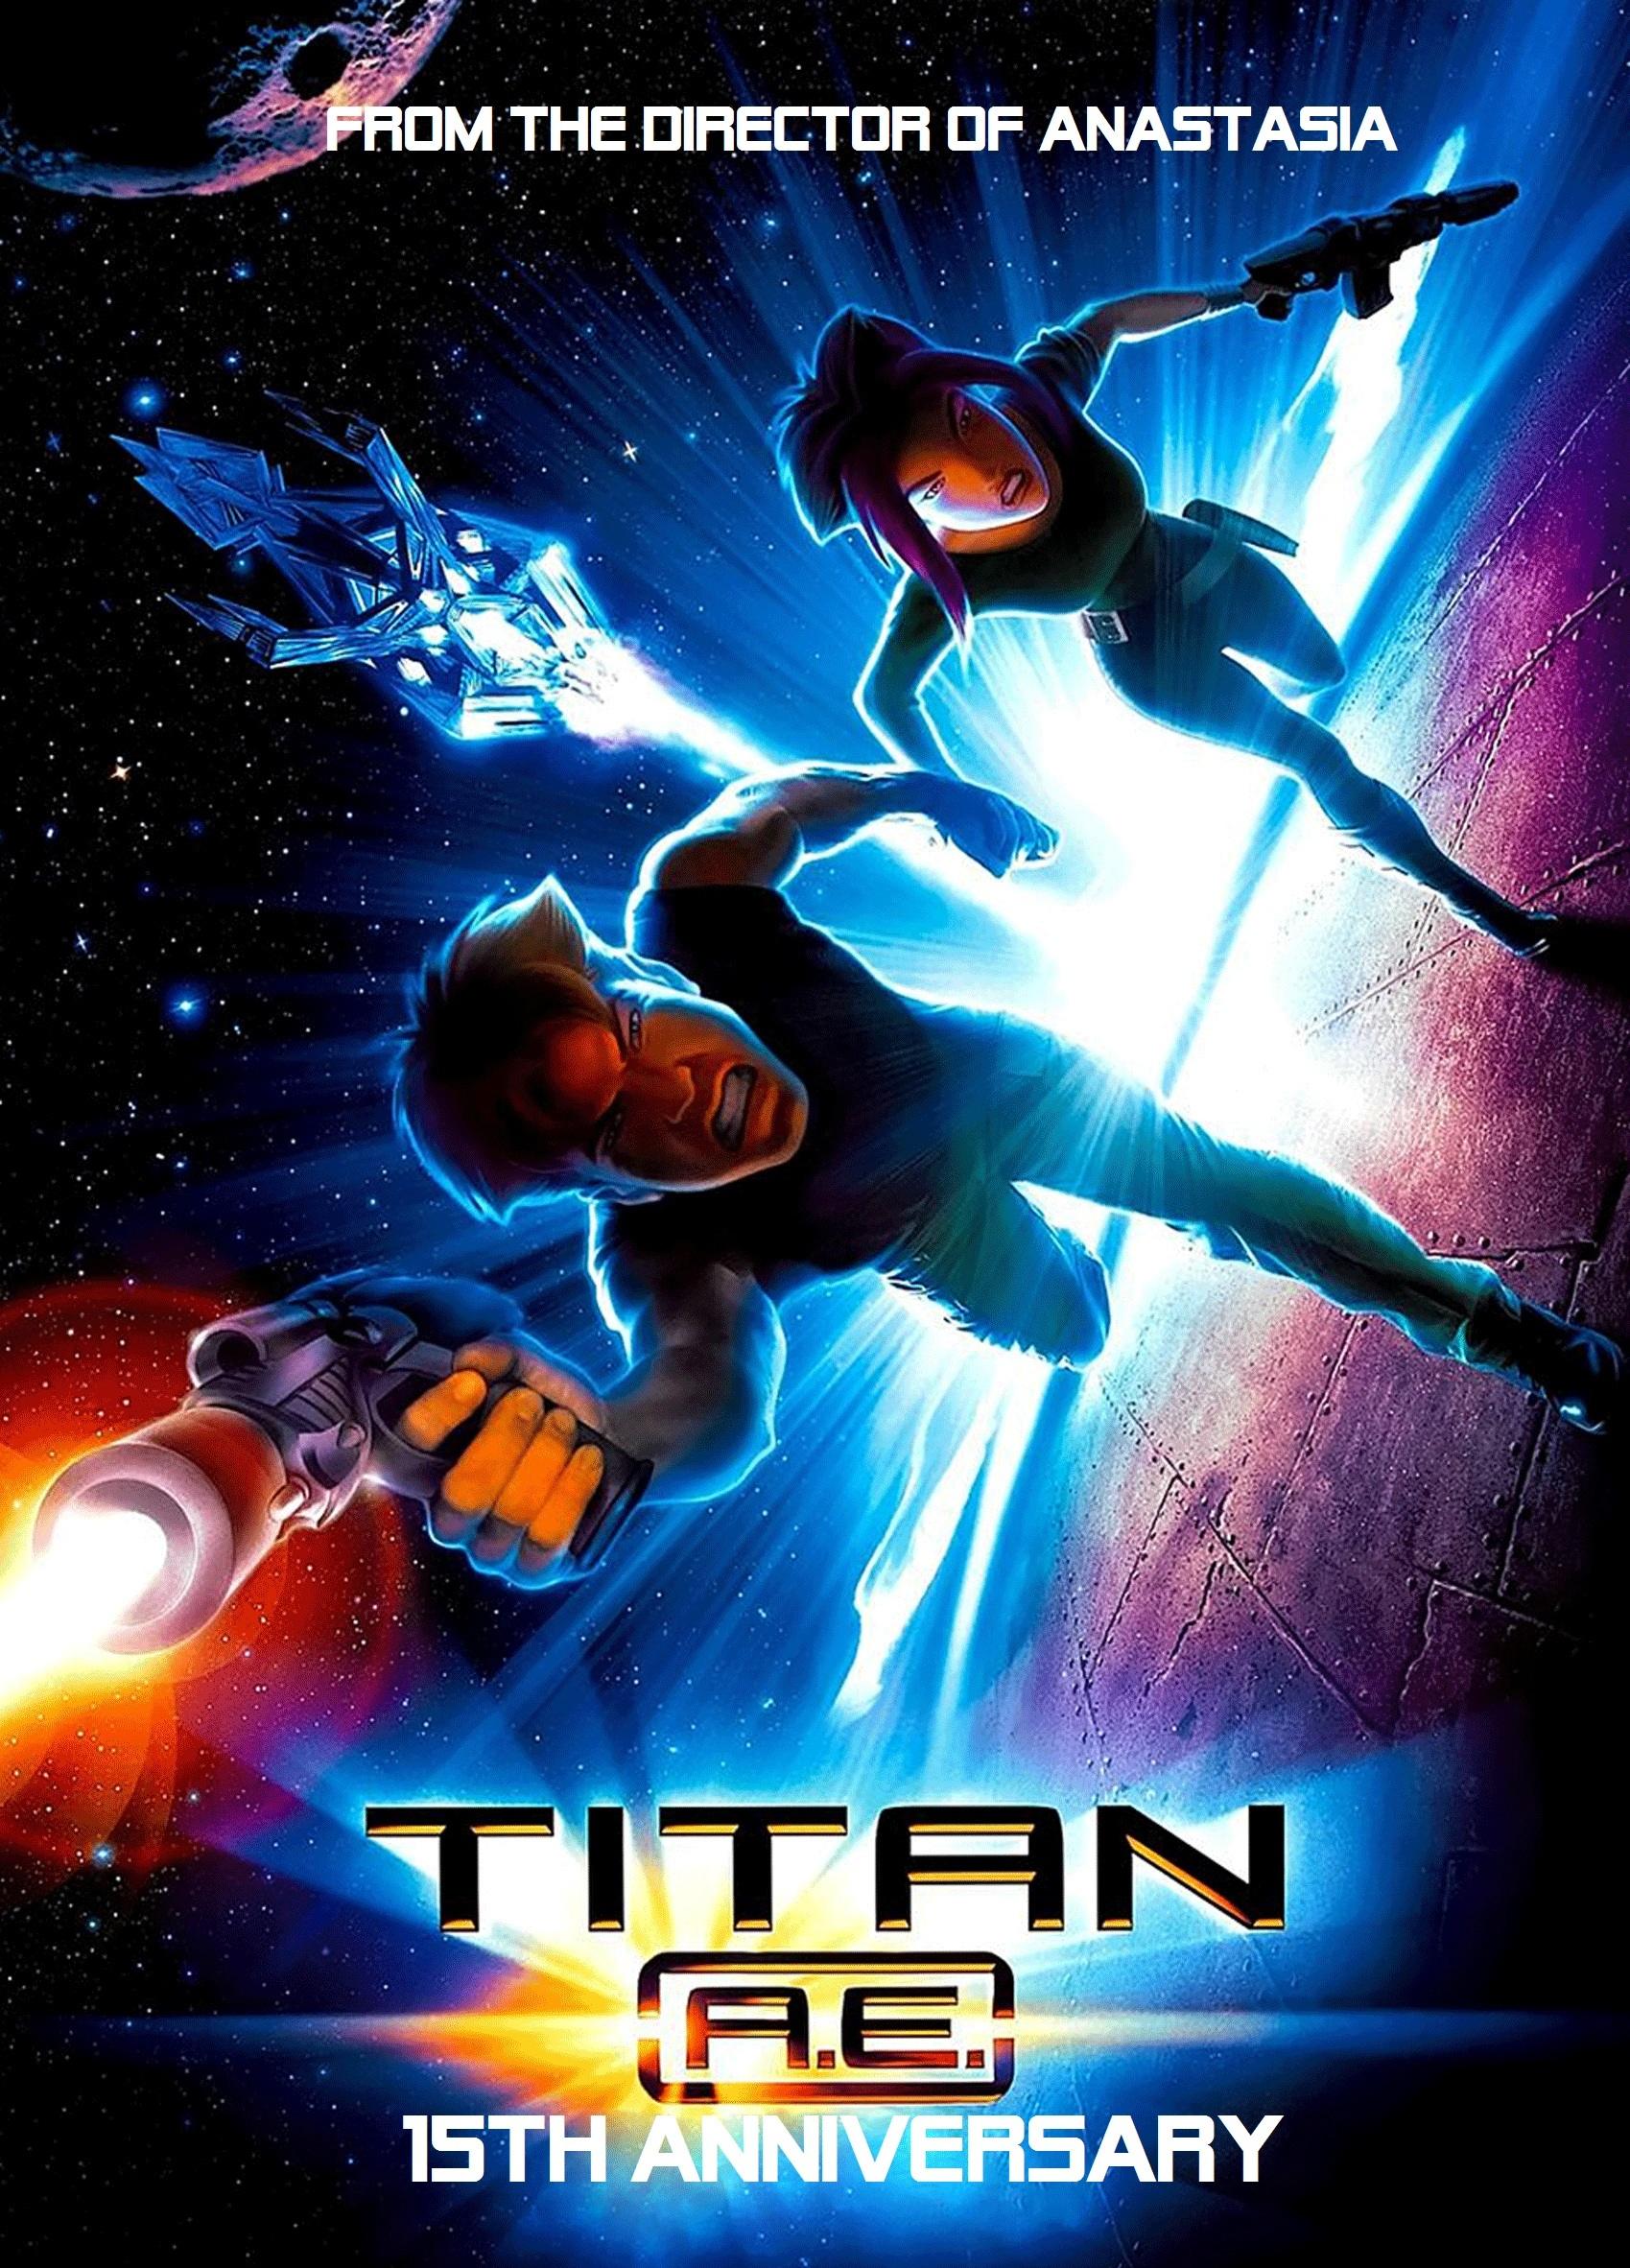 titan ae movie poster.jpg